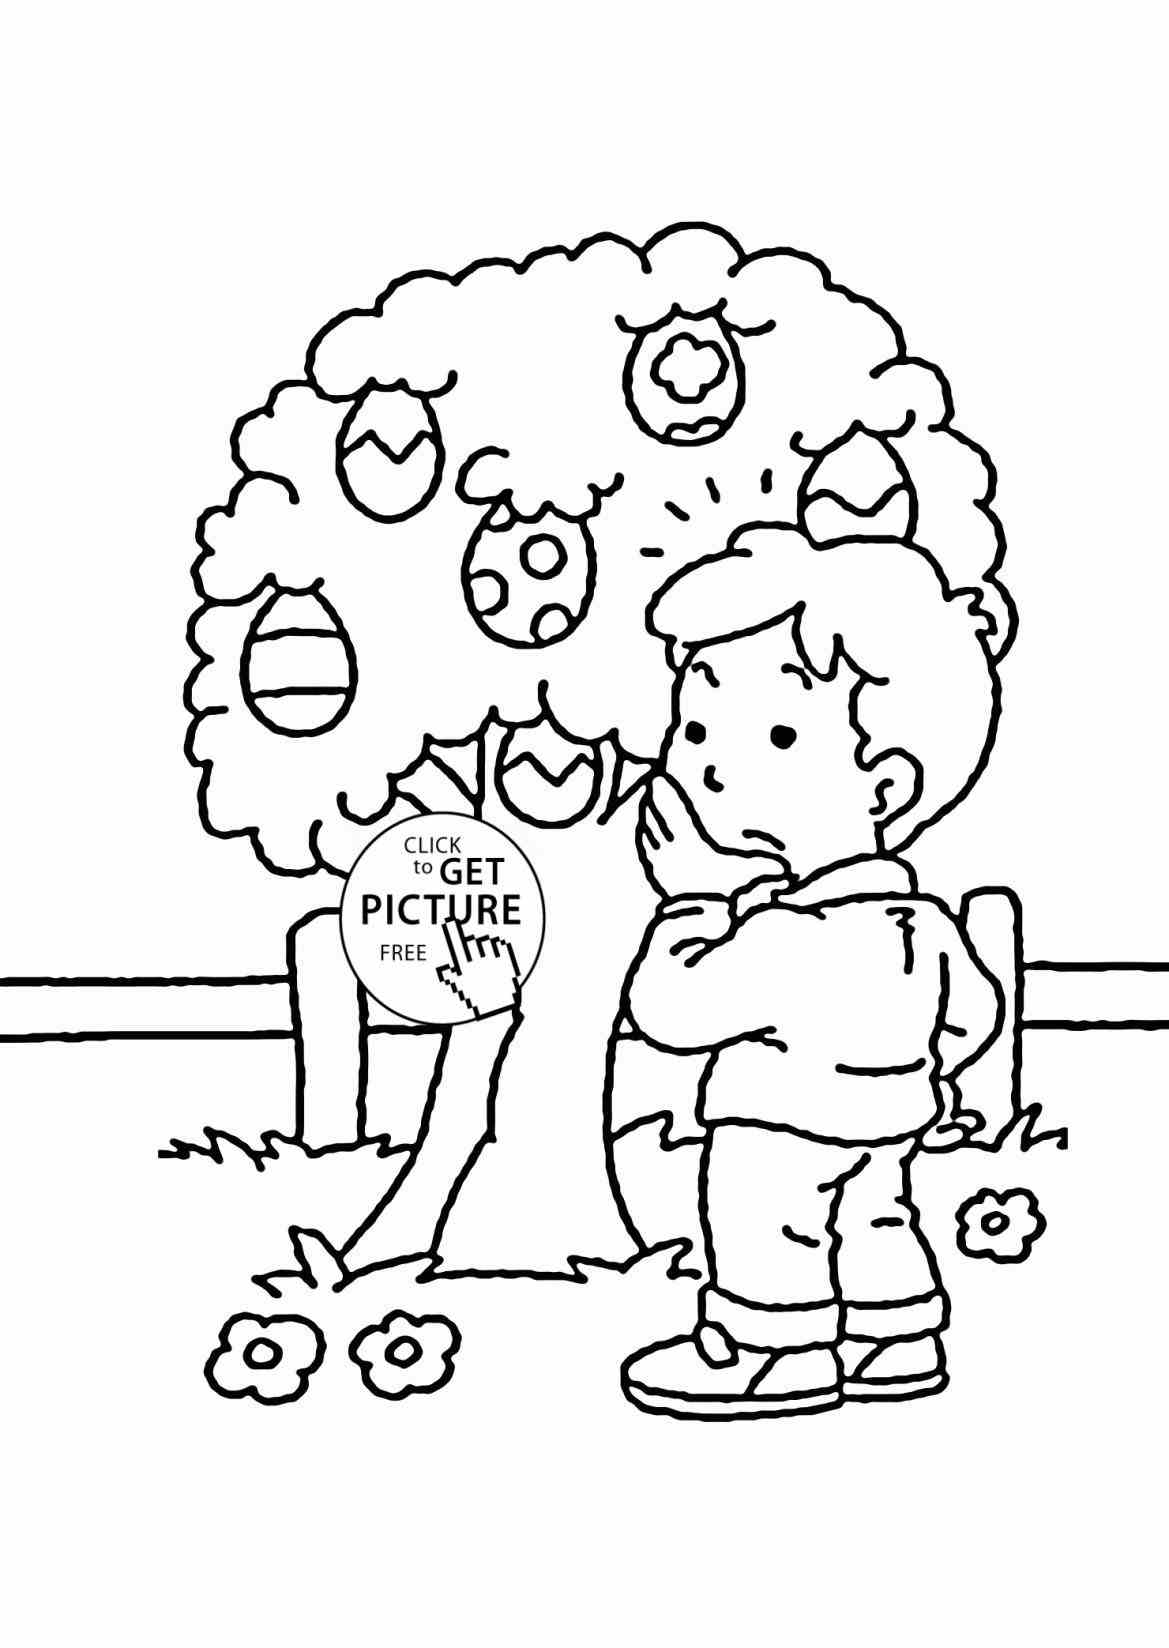 Tree Kangaroo Drawing At Getdrawings